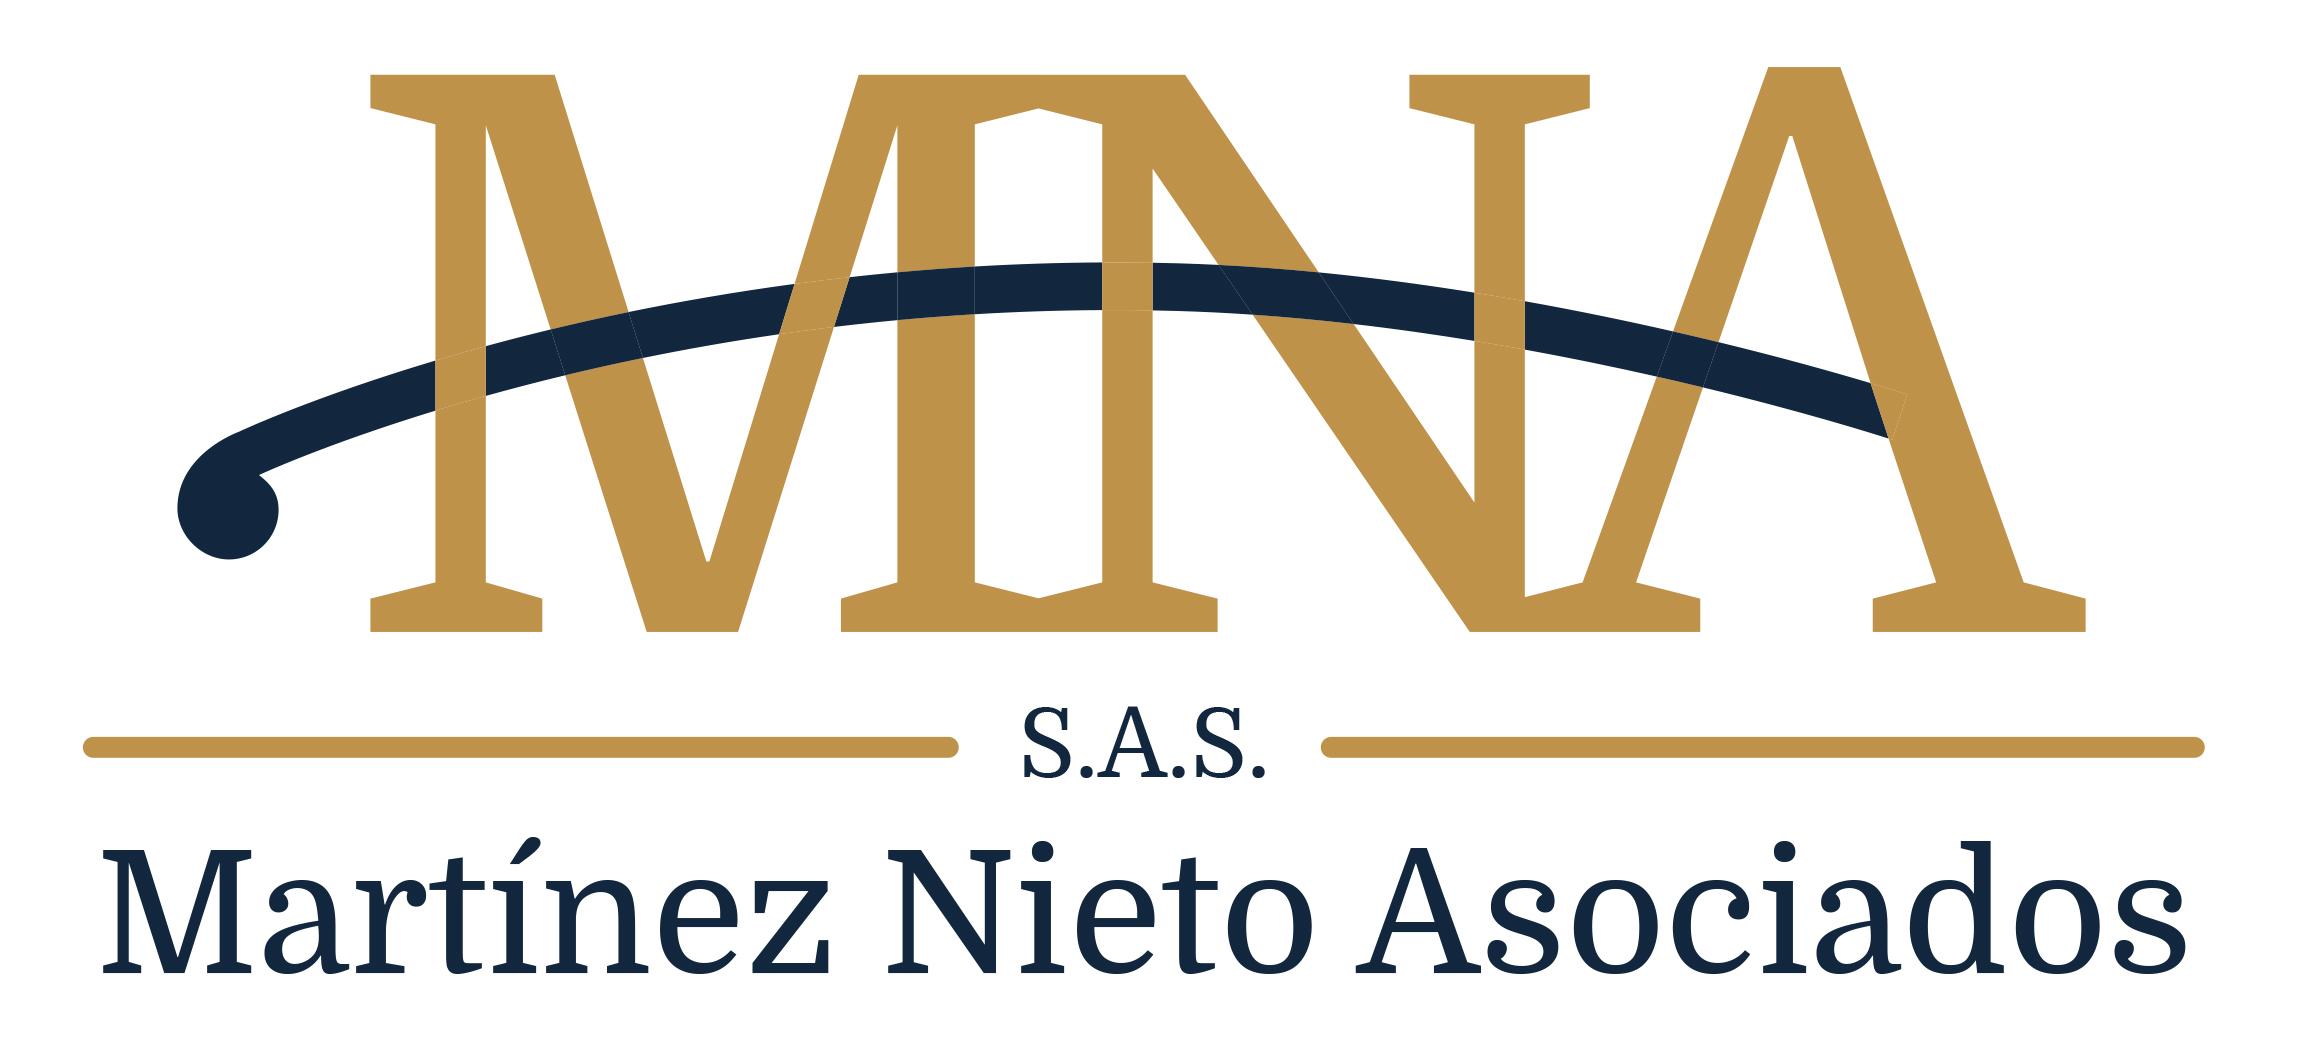 Martinez Nieto Asociados